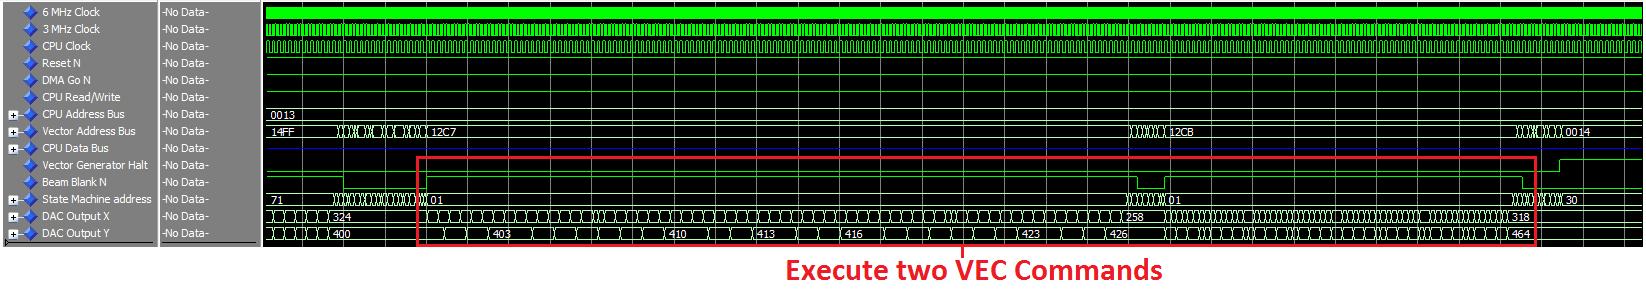 The VEC command